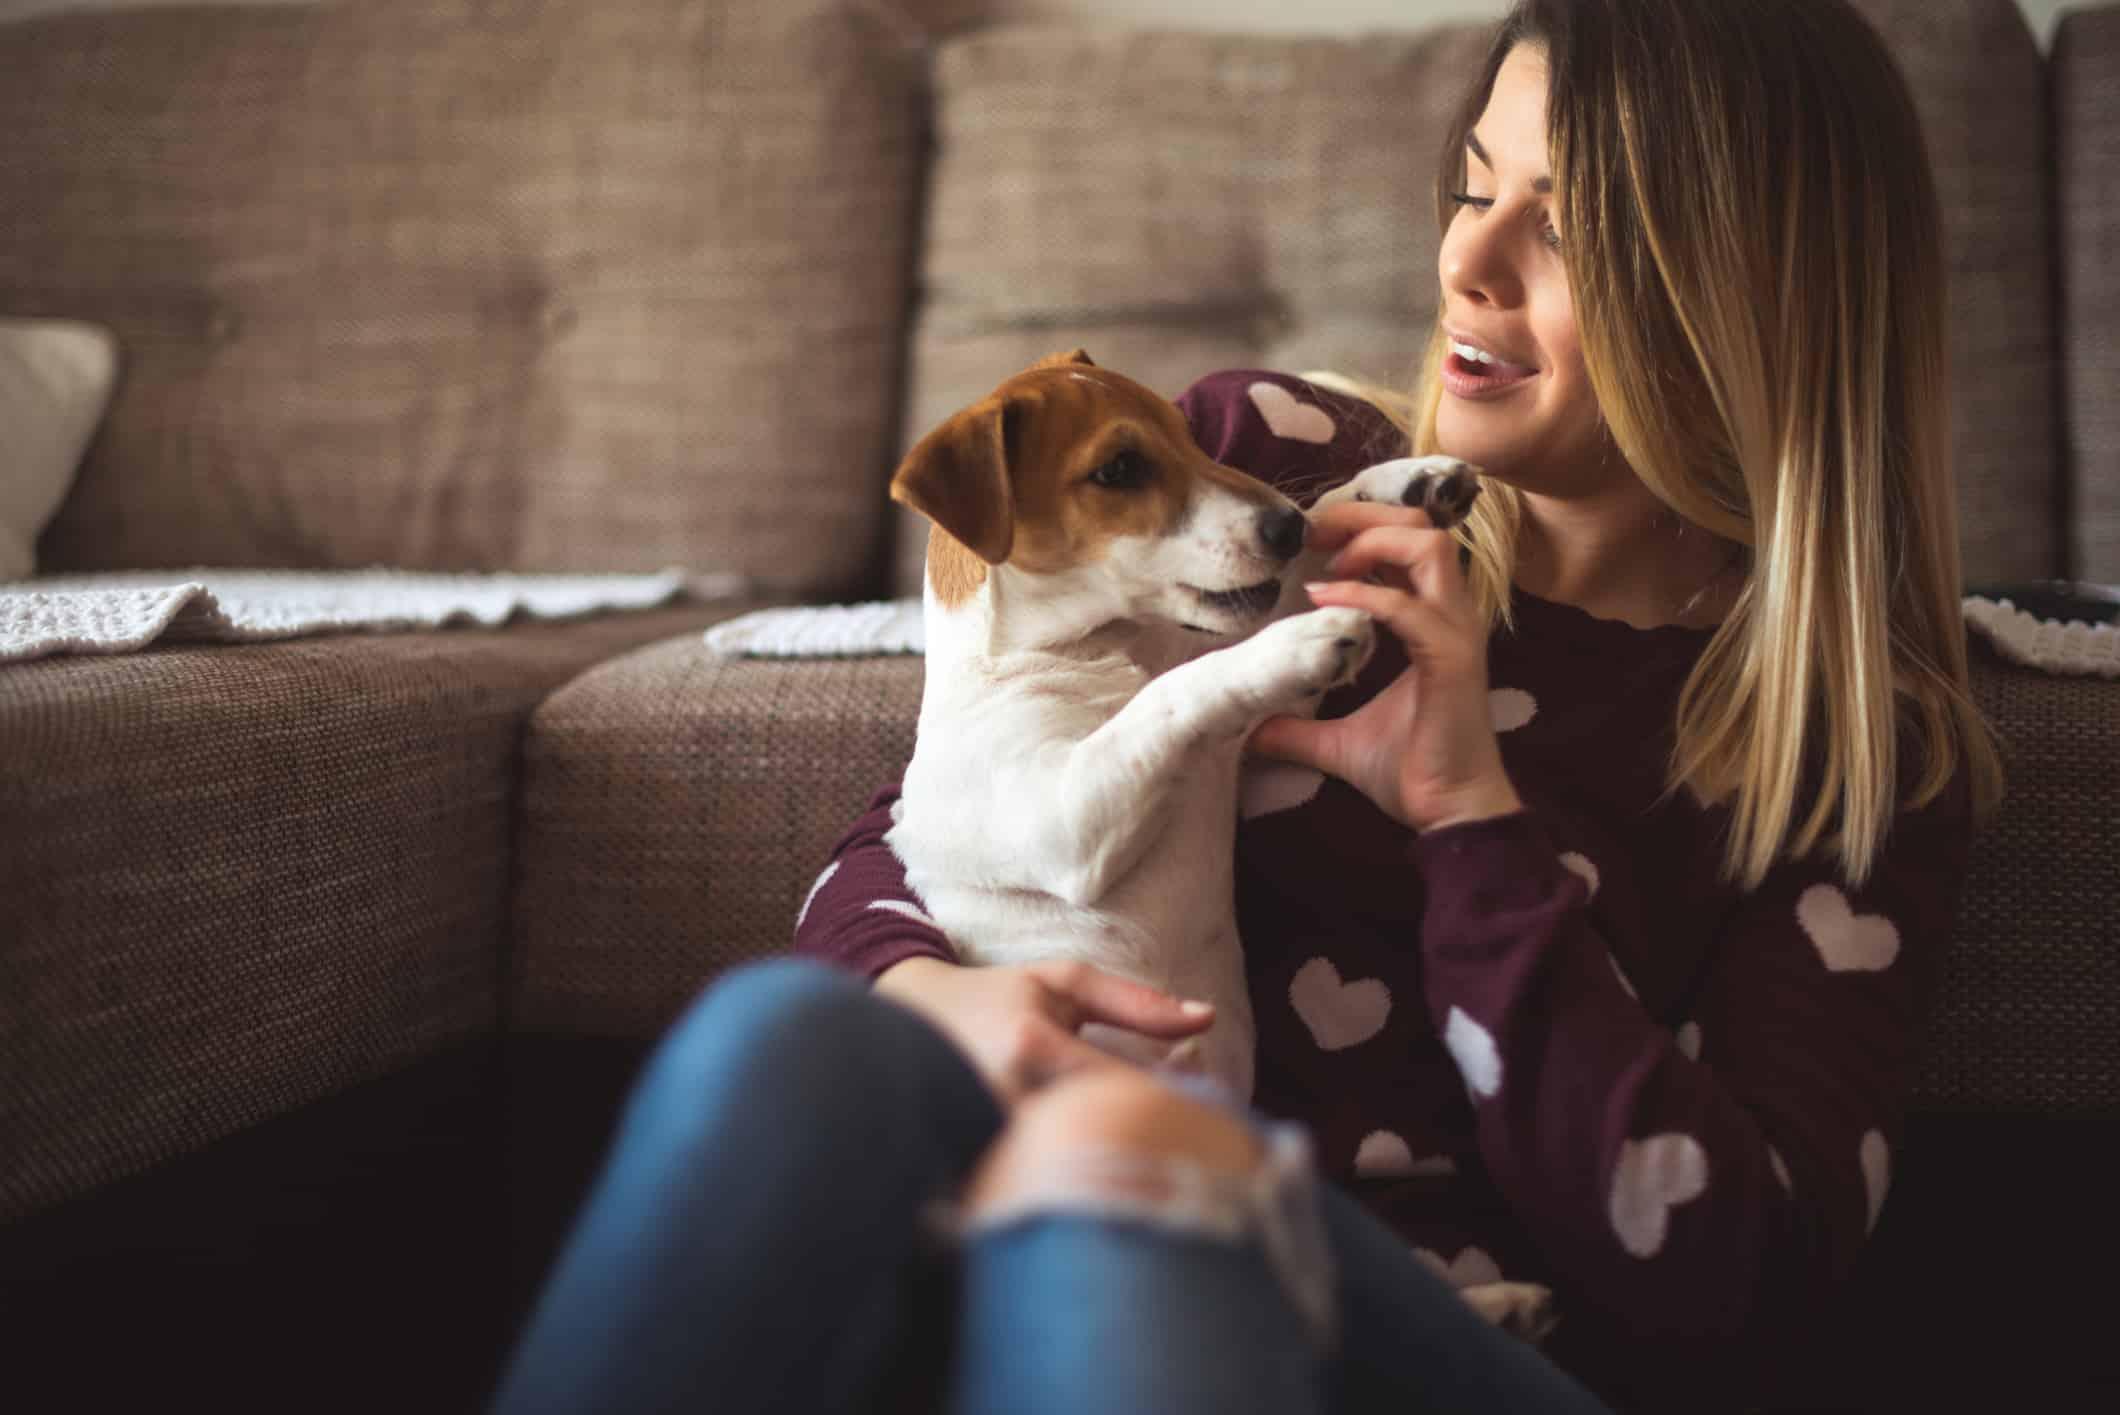 Woman pet sitting as a side hustle